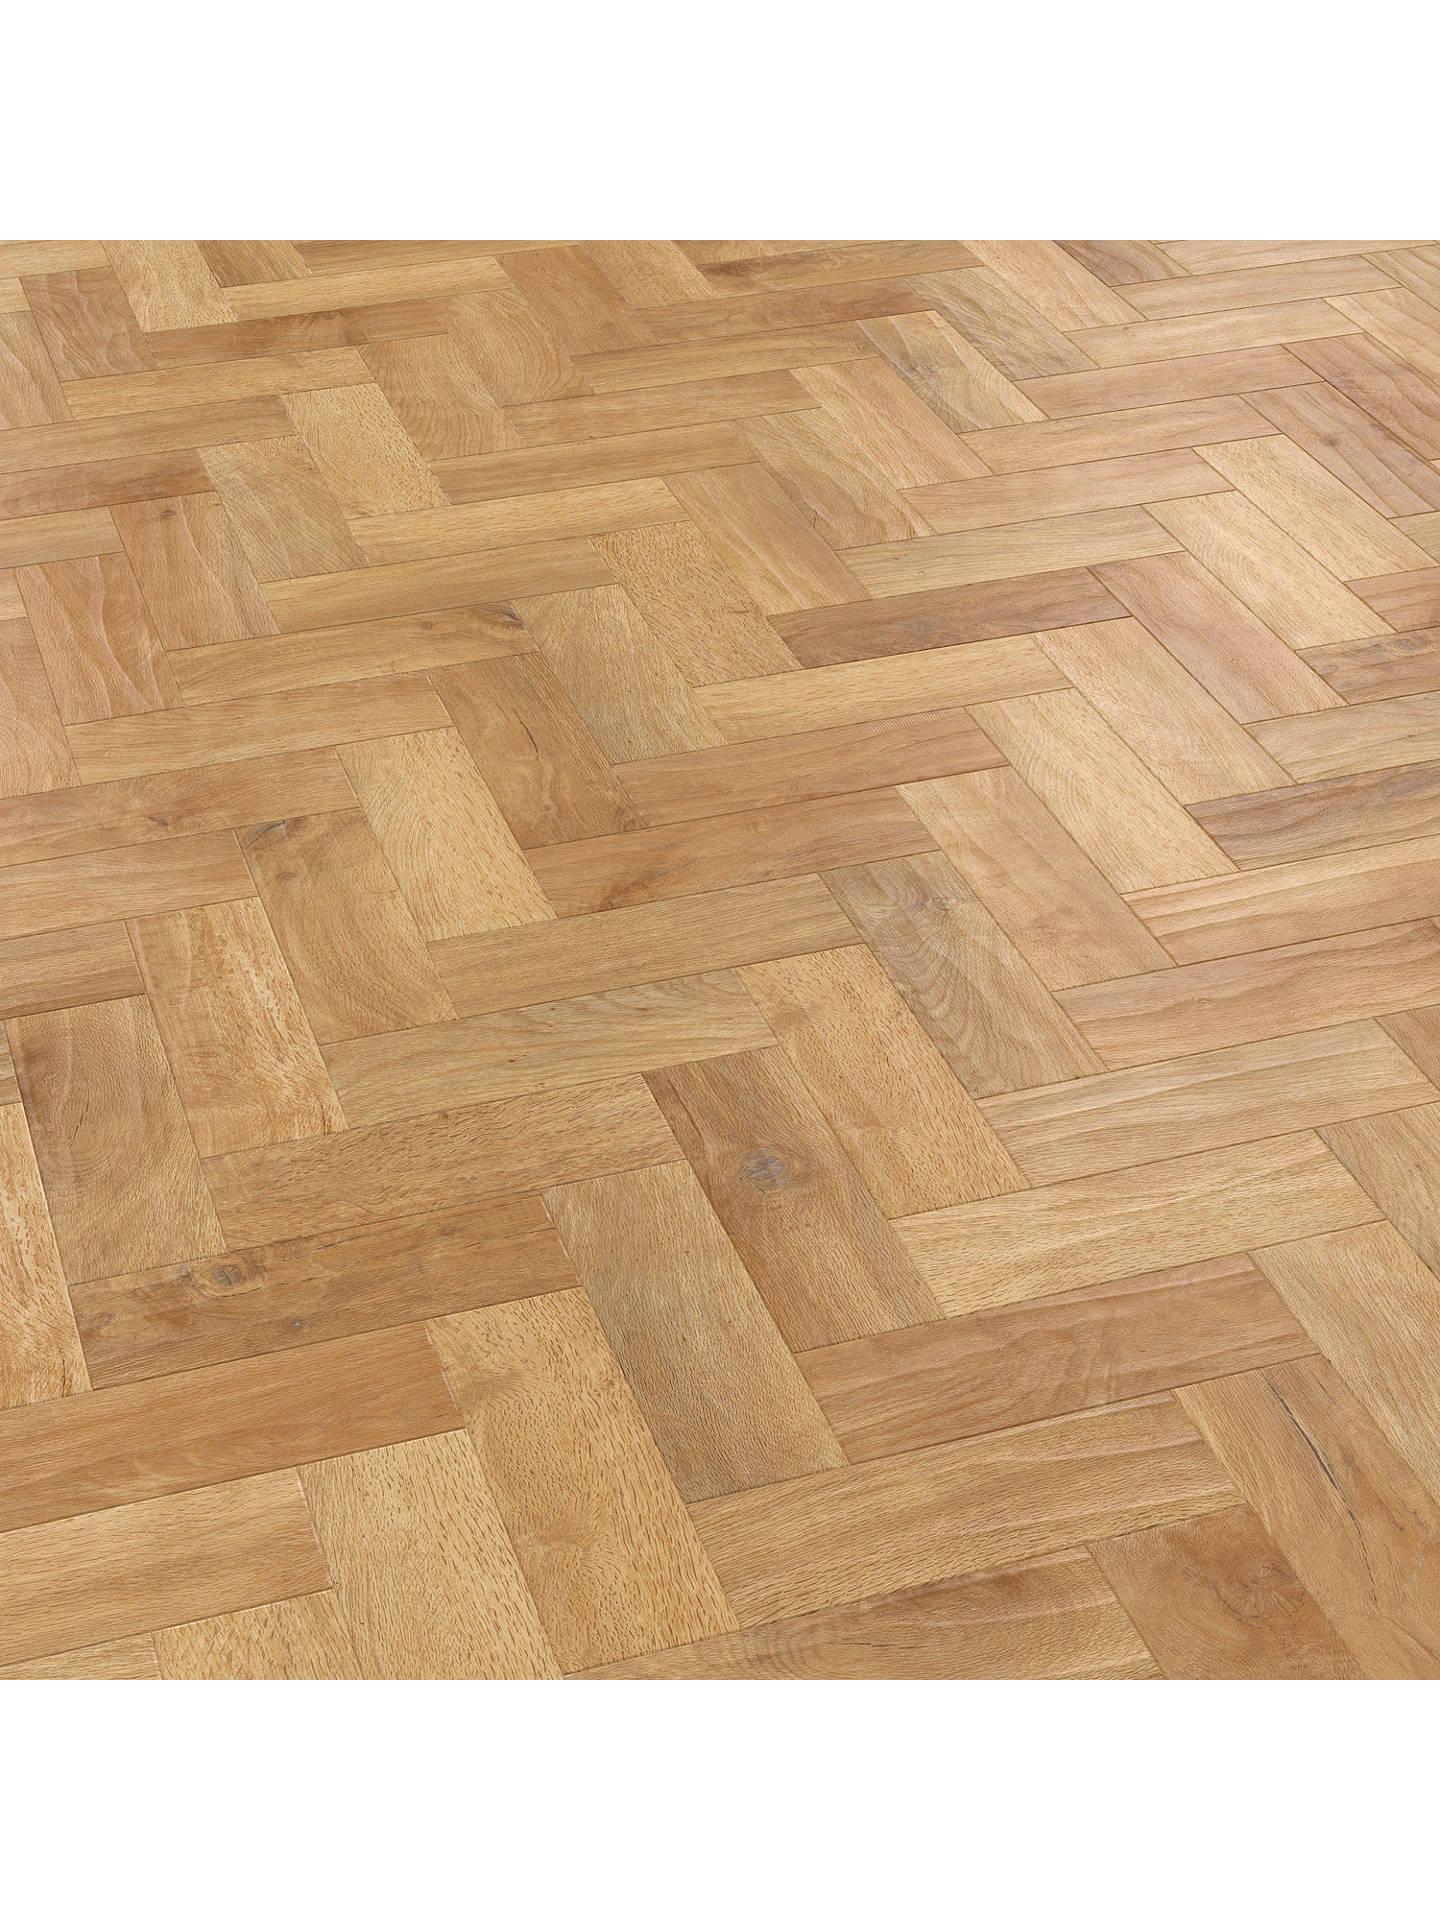 Luxury Vinyl Tile Wood Parquet Flooring